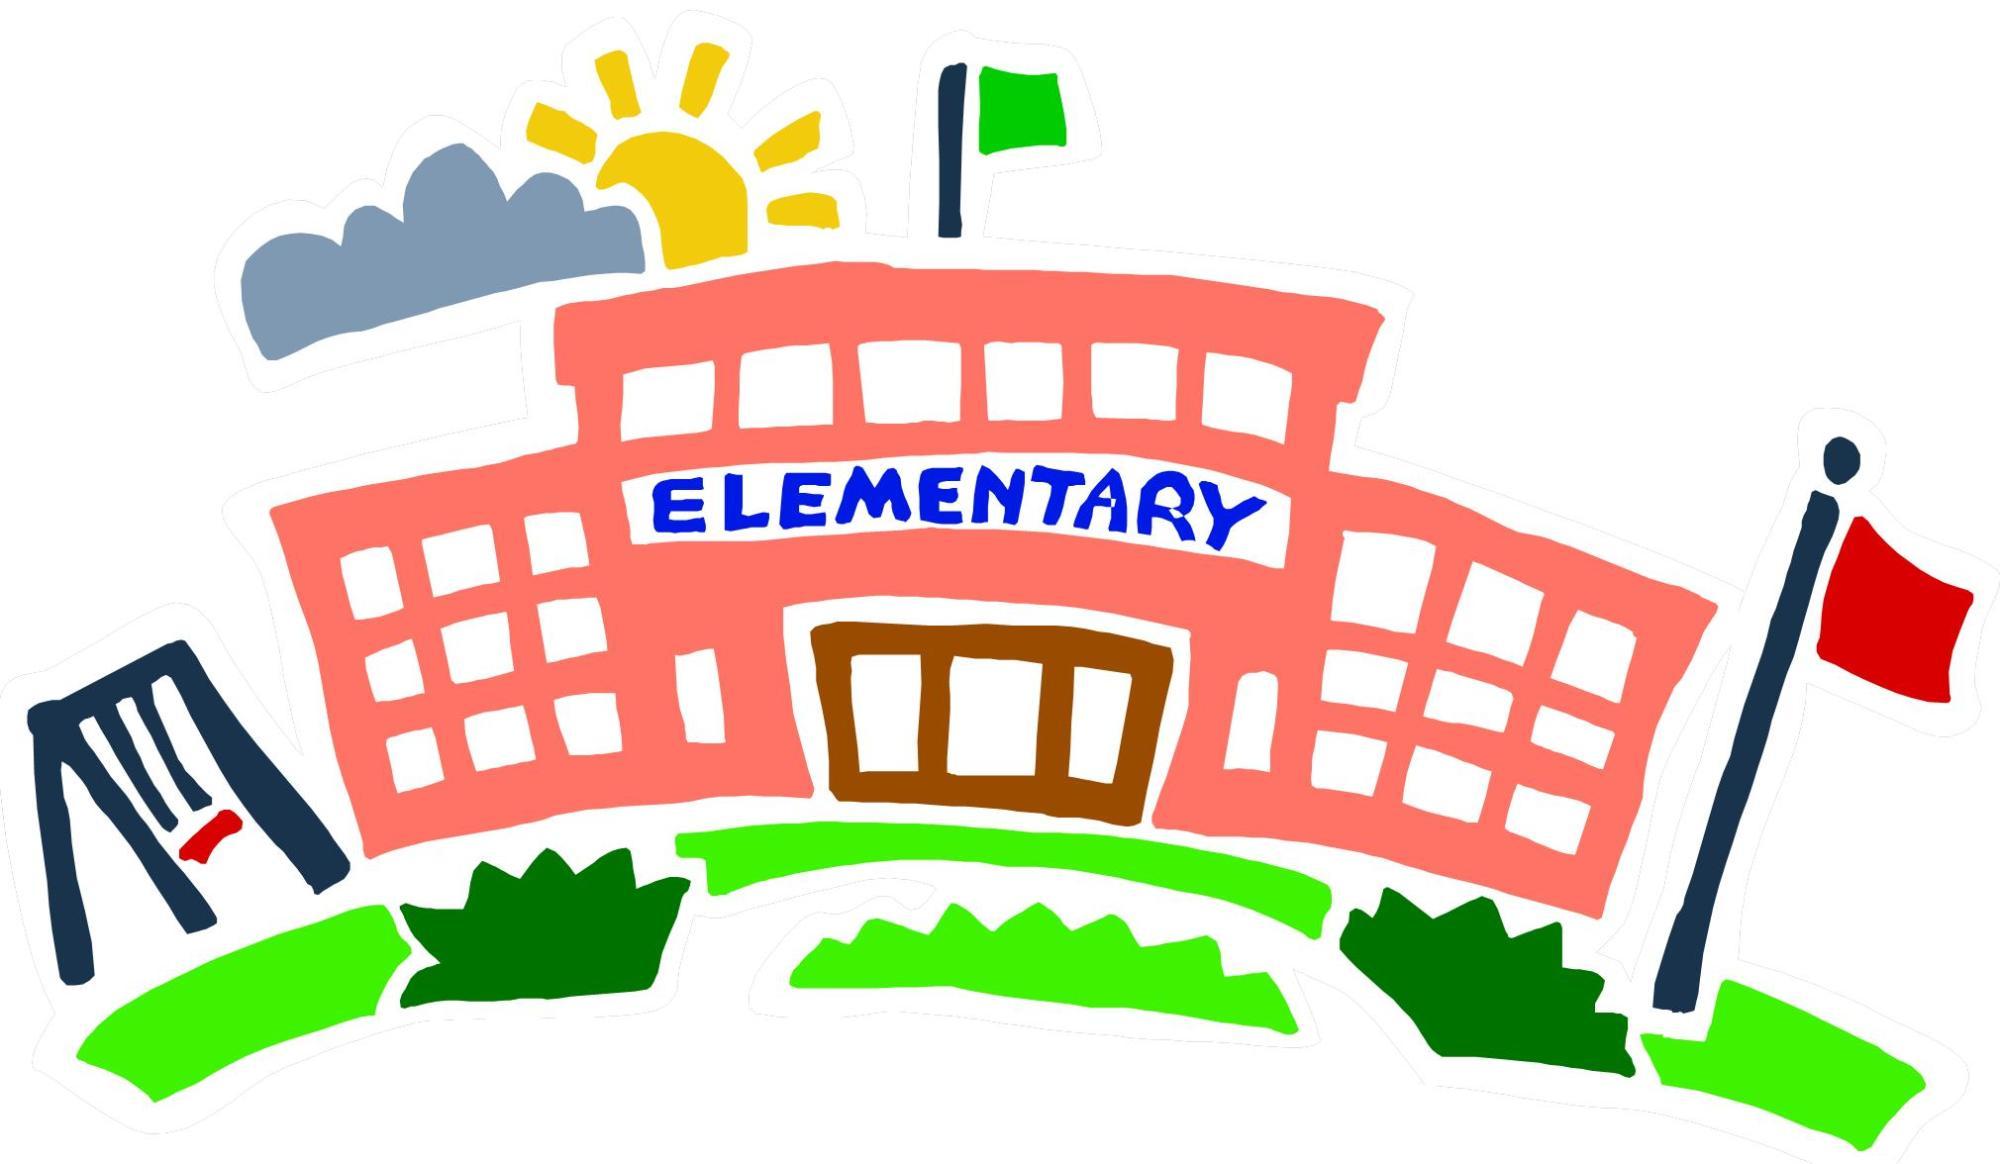 hight resolution of free school clip art from vergilis clipart elementary